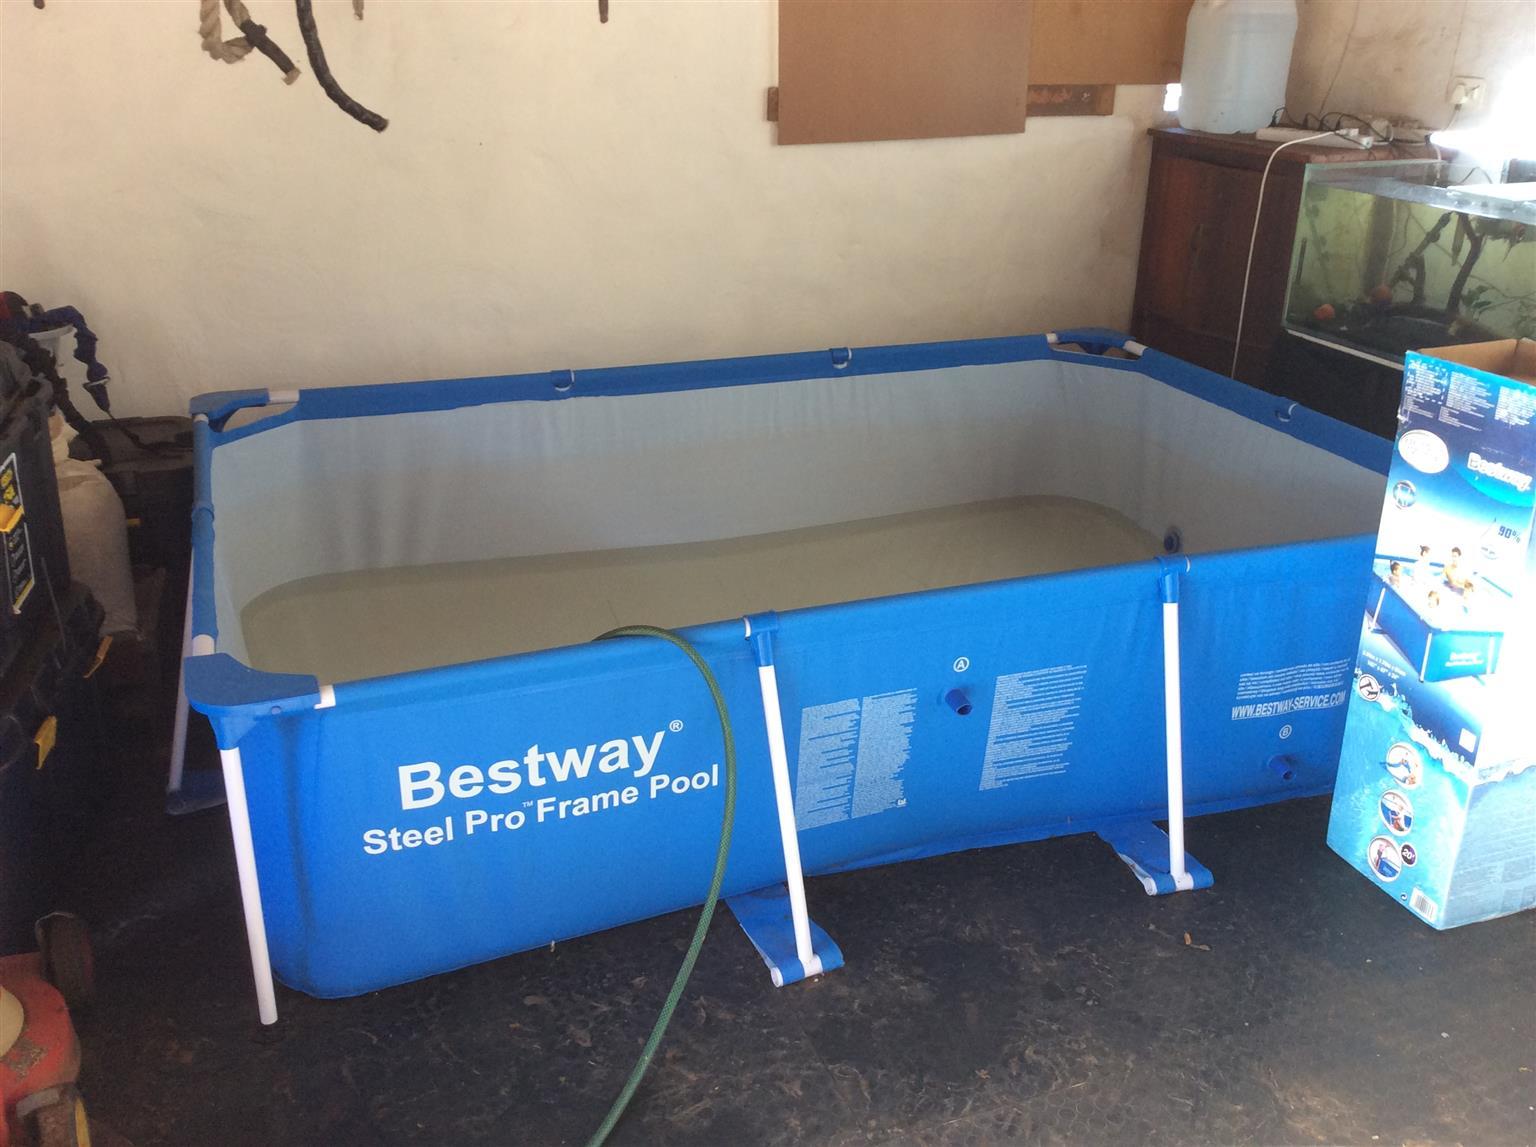 Portable pool steel frame bestway junk mail - Intex swimming pool accessories south africa ...